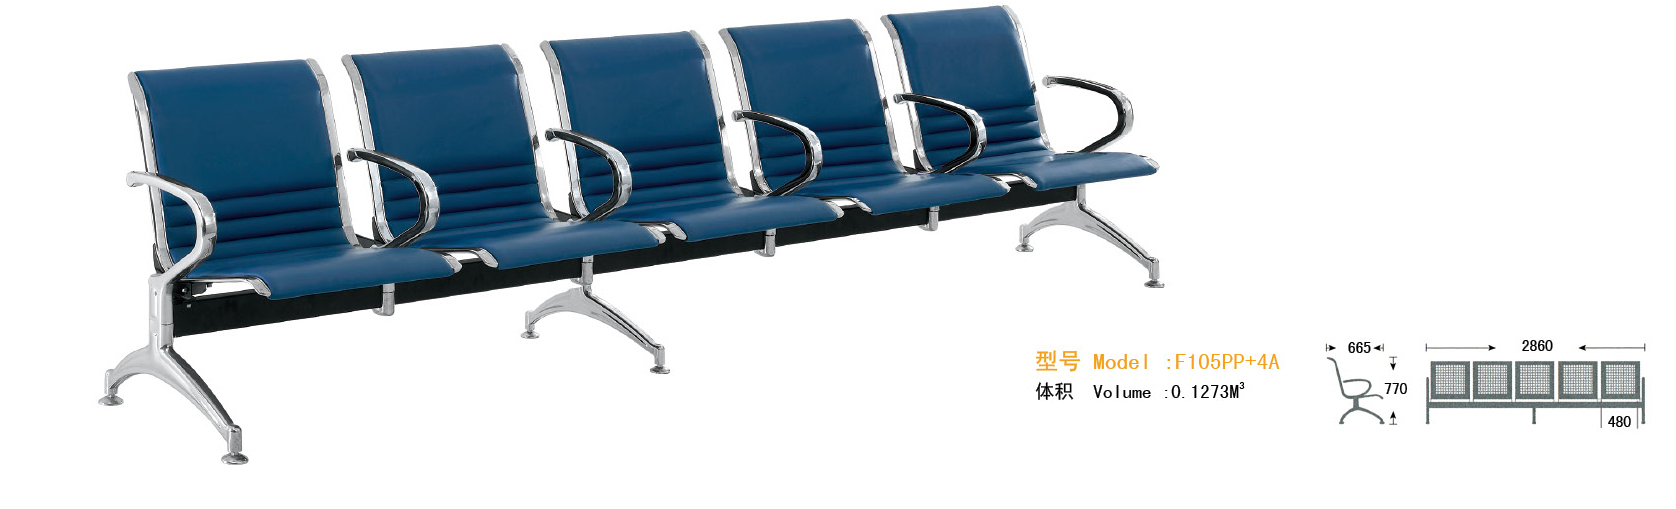 WNACS-Five SeatsAirport Waiting Chair with  PVC or PU Cushion